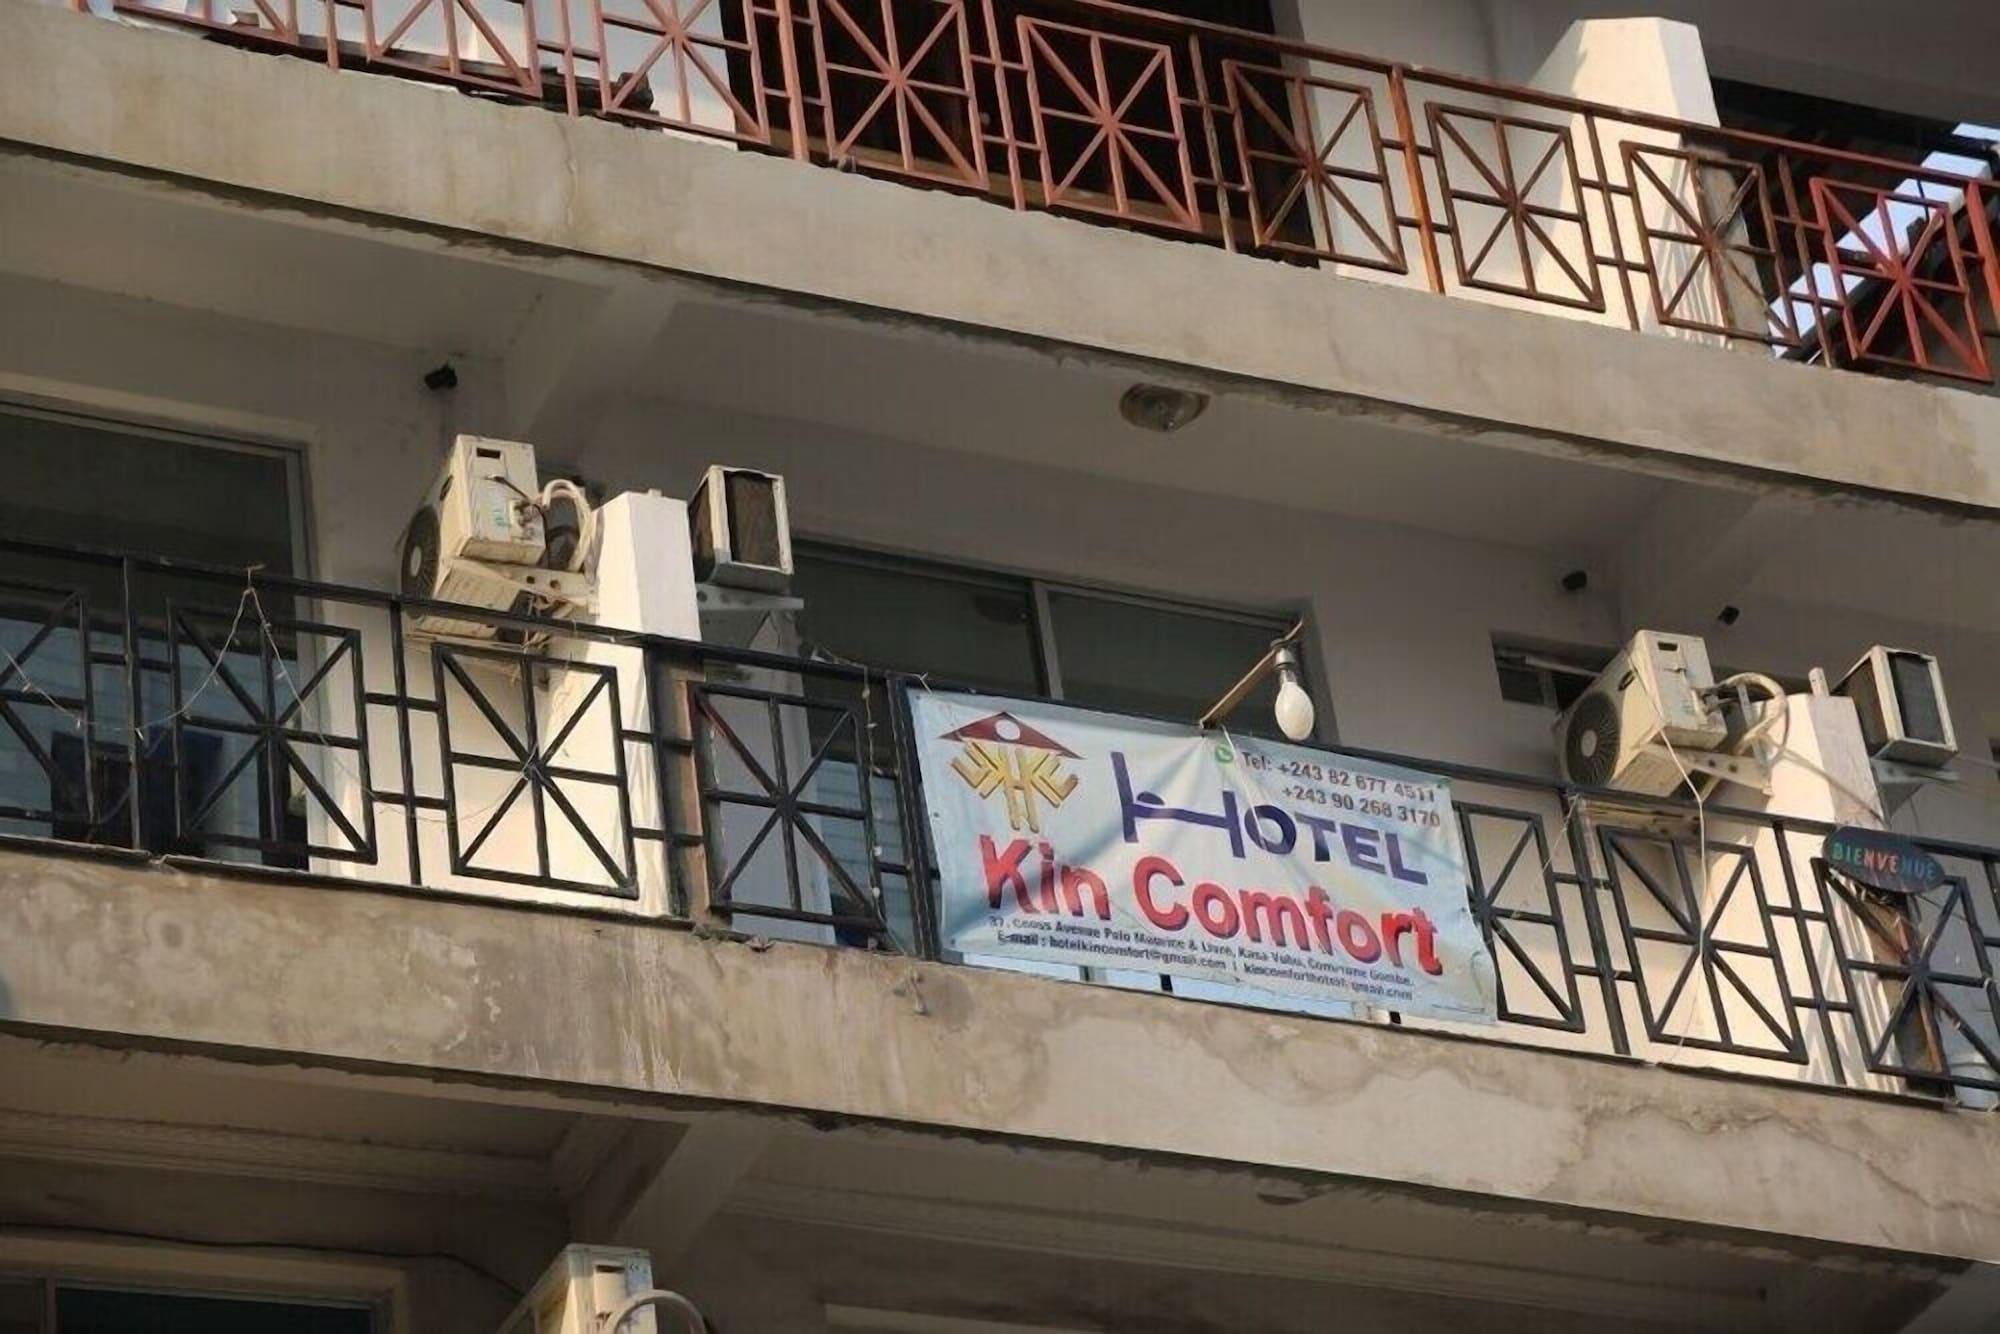 Hotel Kin Comfort, Kinshasa